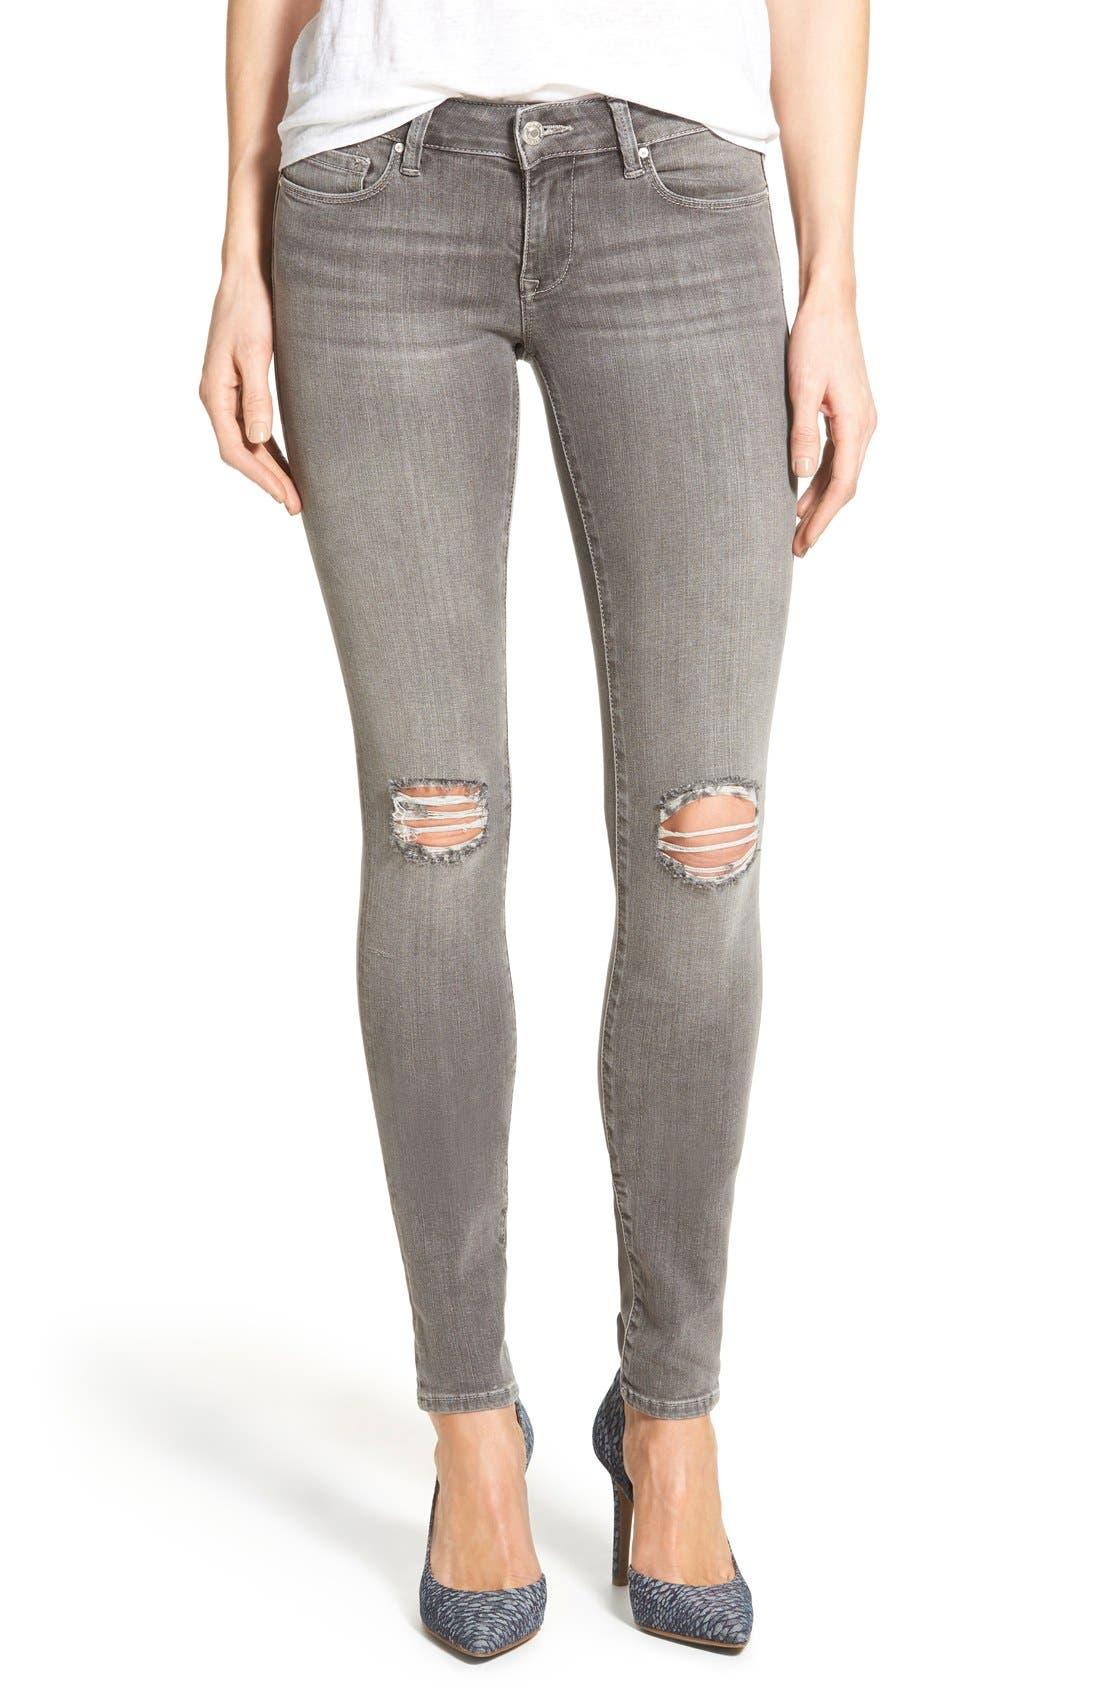 Main Image - Mavi Jeans 'Serena' Distressed Stretch Skinny Jeans (Grey Ripped)